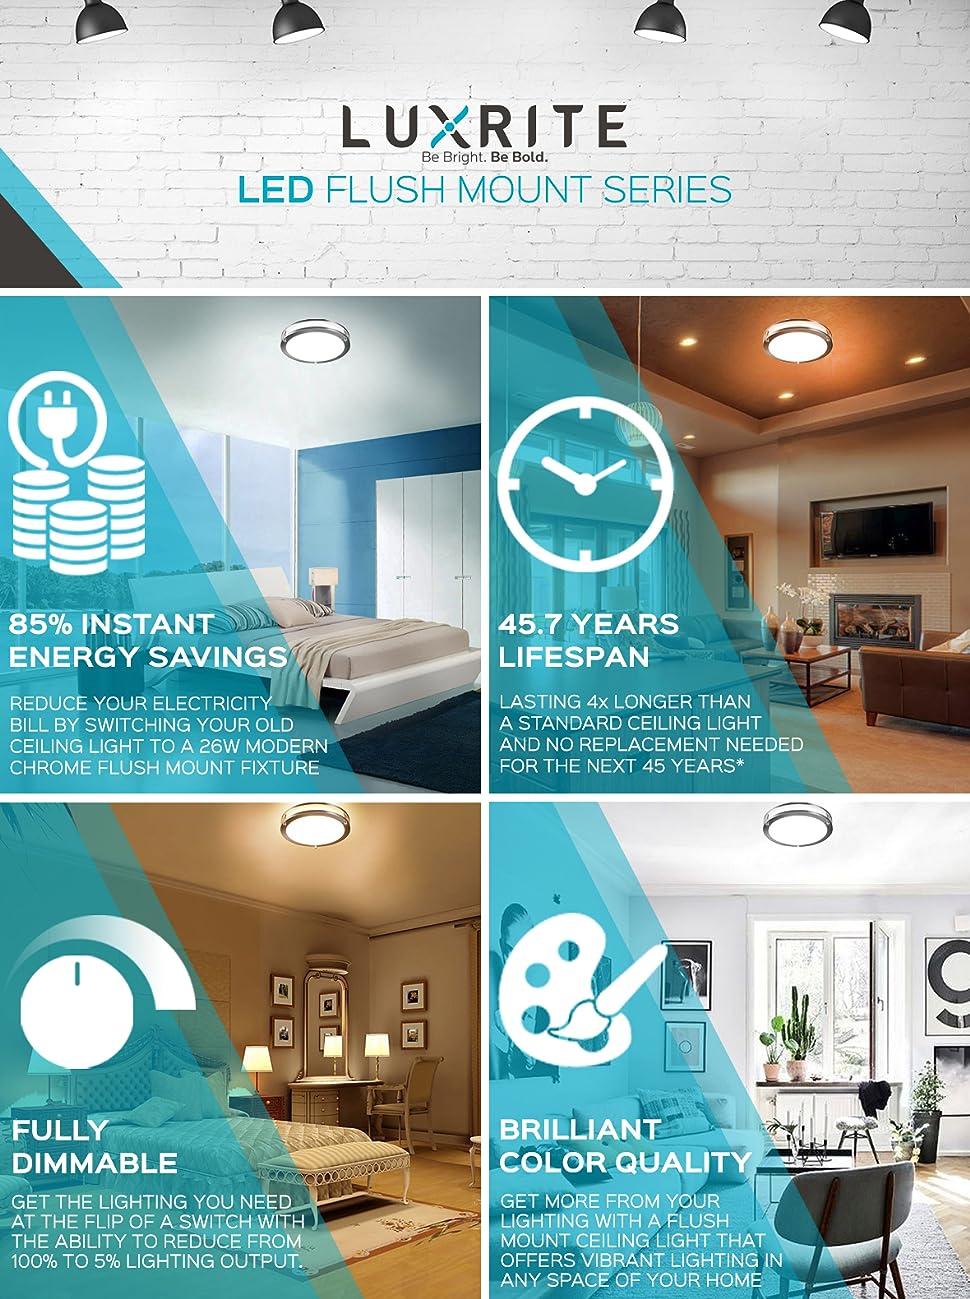 Luxrite LED Flush Mount Ceiling Light, 16 Inch, Dimmable, 5000K ...